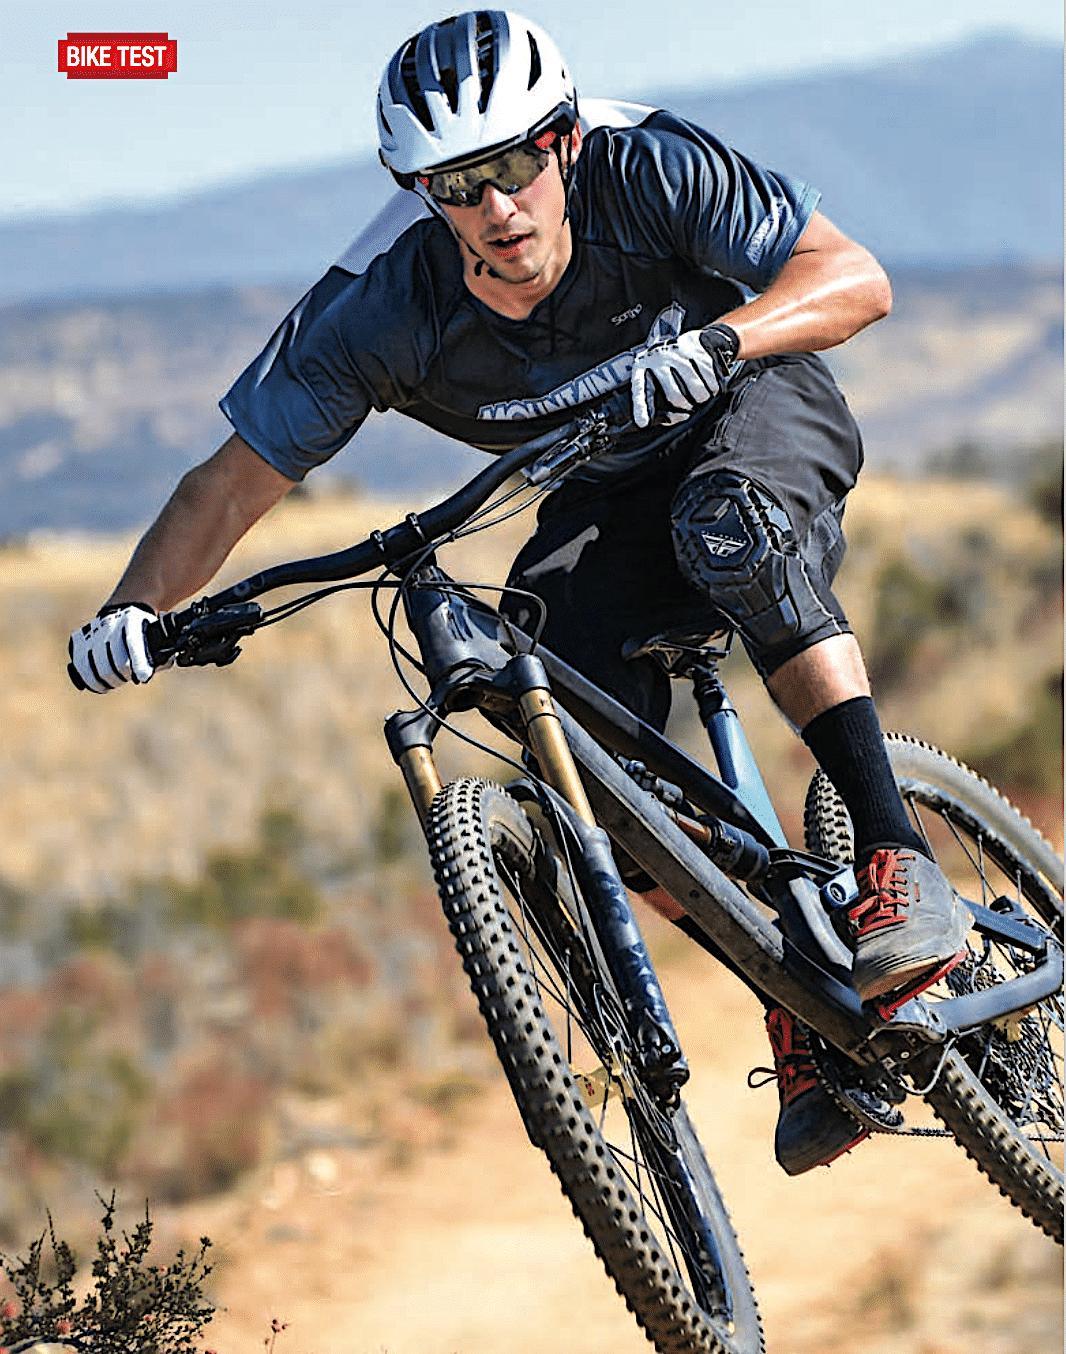 Bike Test: Canyon Torque CF 9 0 PRO   Mountain Bike Action Magazine